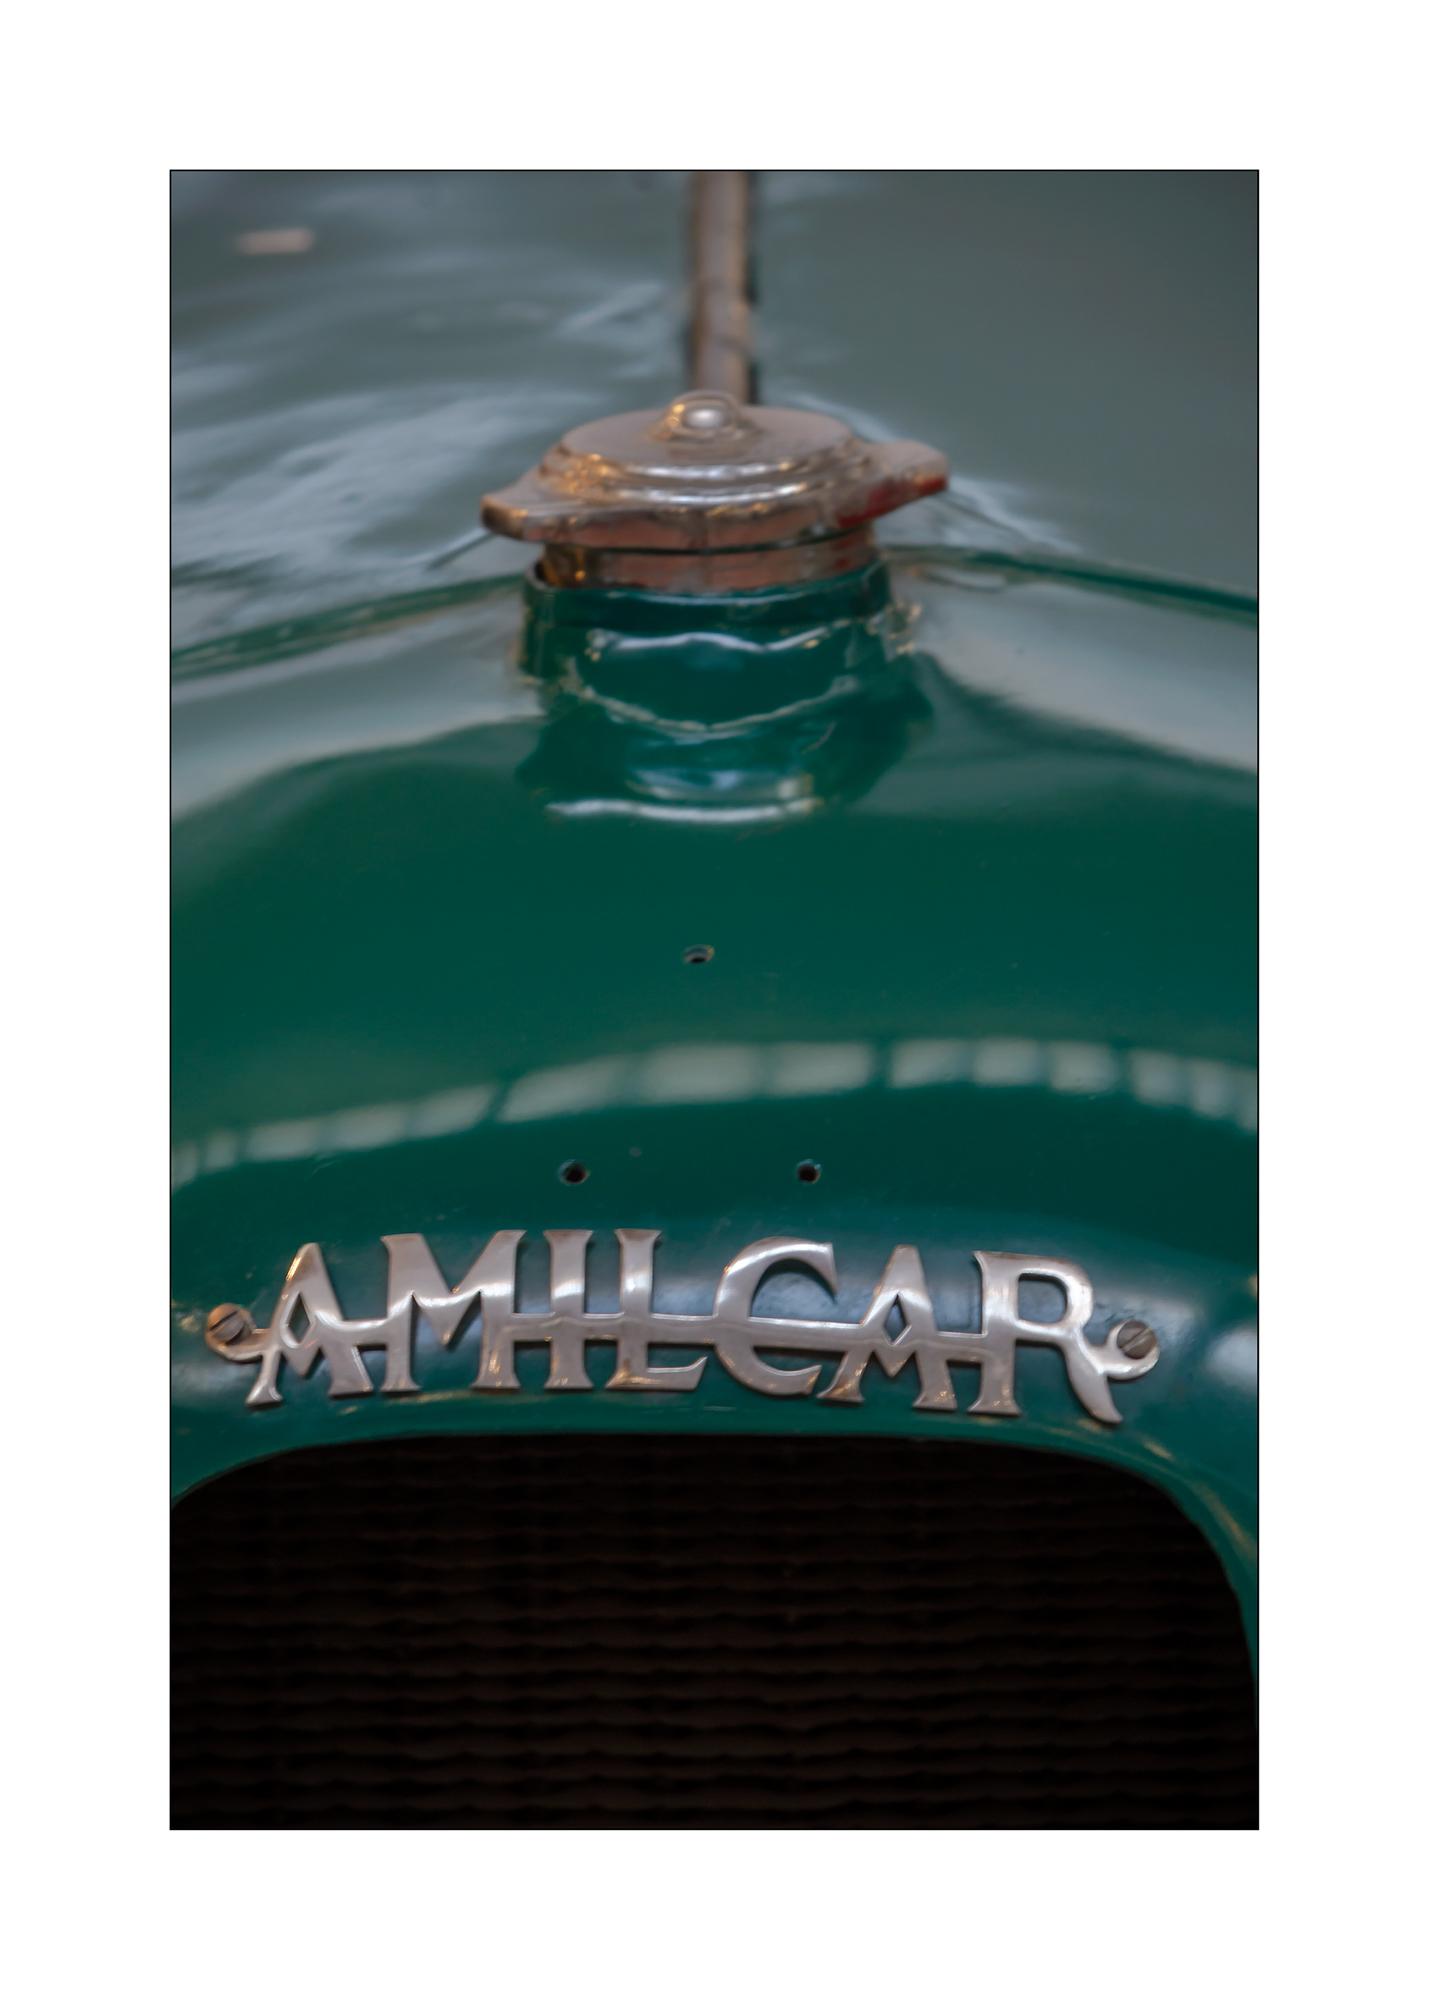 Amilcar_1926